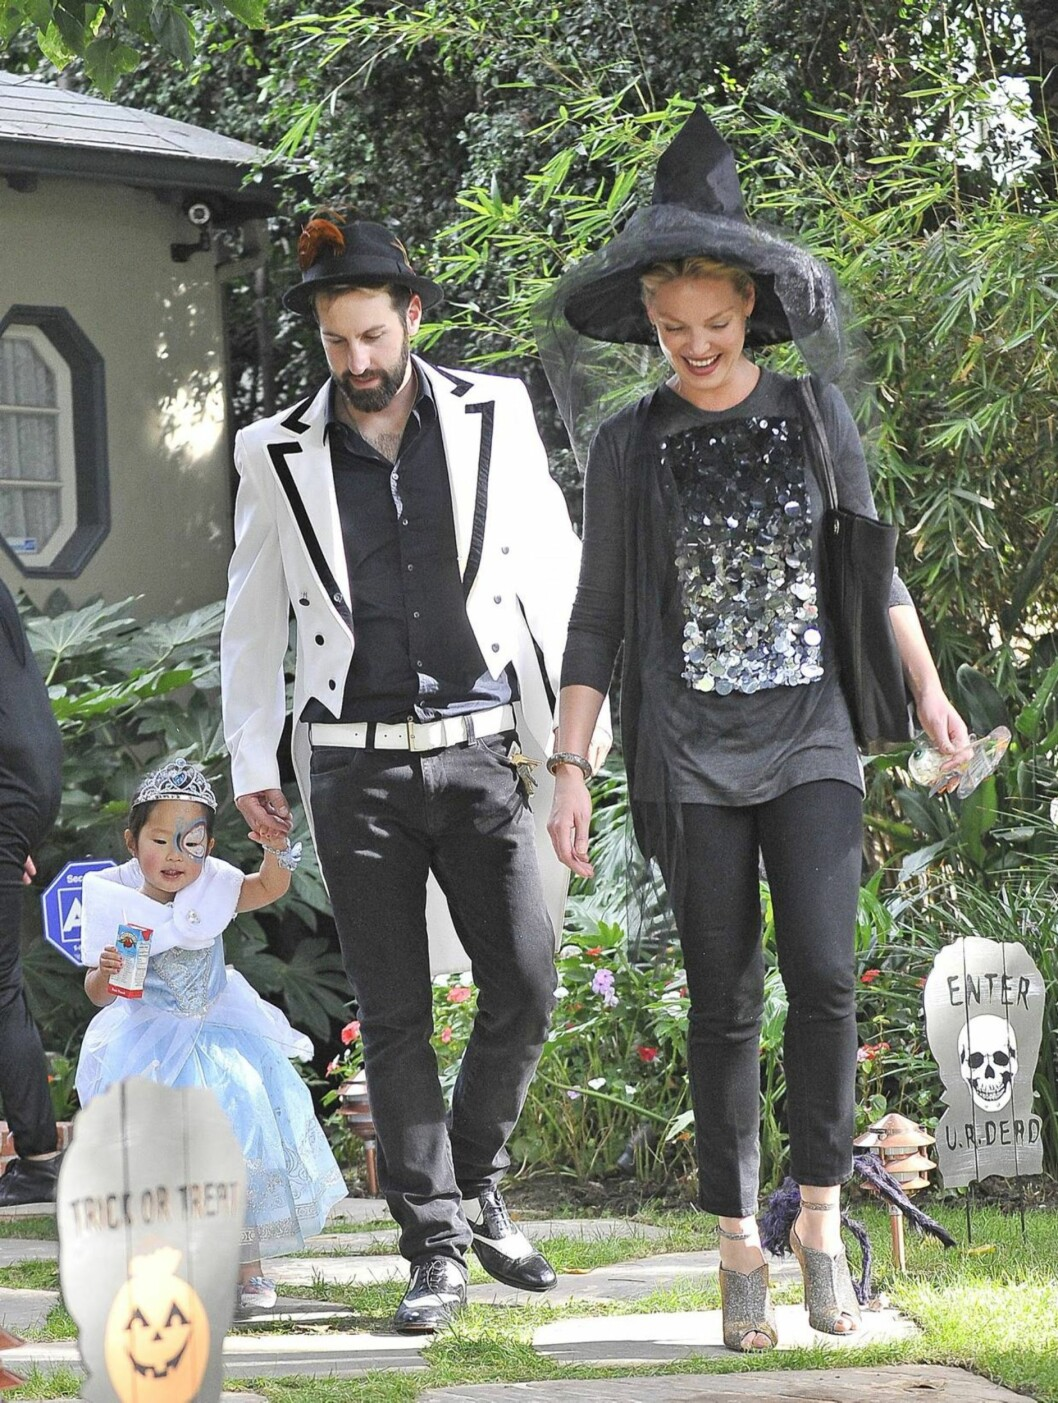 HELE FAMILIEN: Katherine Heigl og ektemannen Josh Kelley er sammen med sin datter Naleigh på vei til halloweenfest i Hollywood Hills. Foto: All Over Press